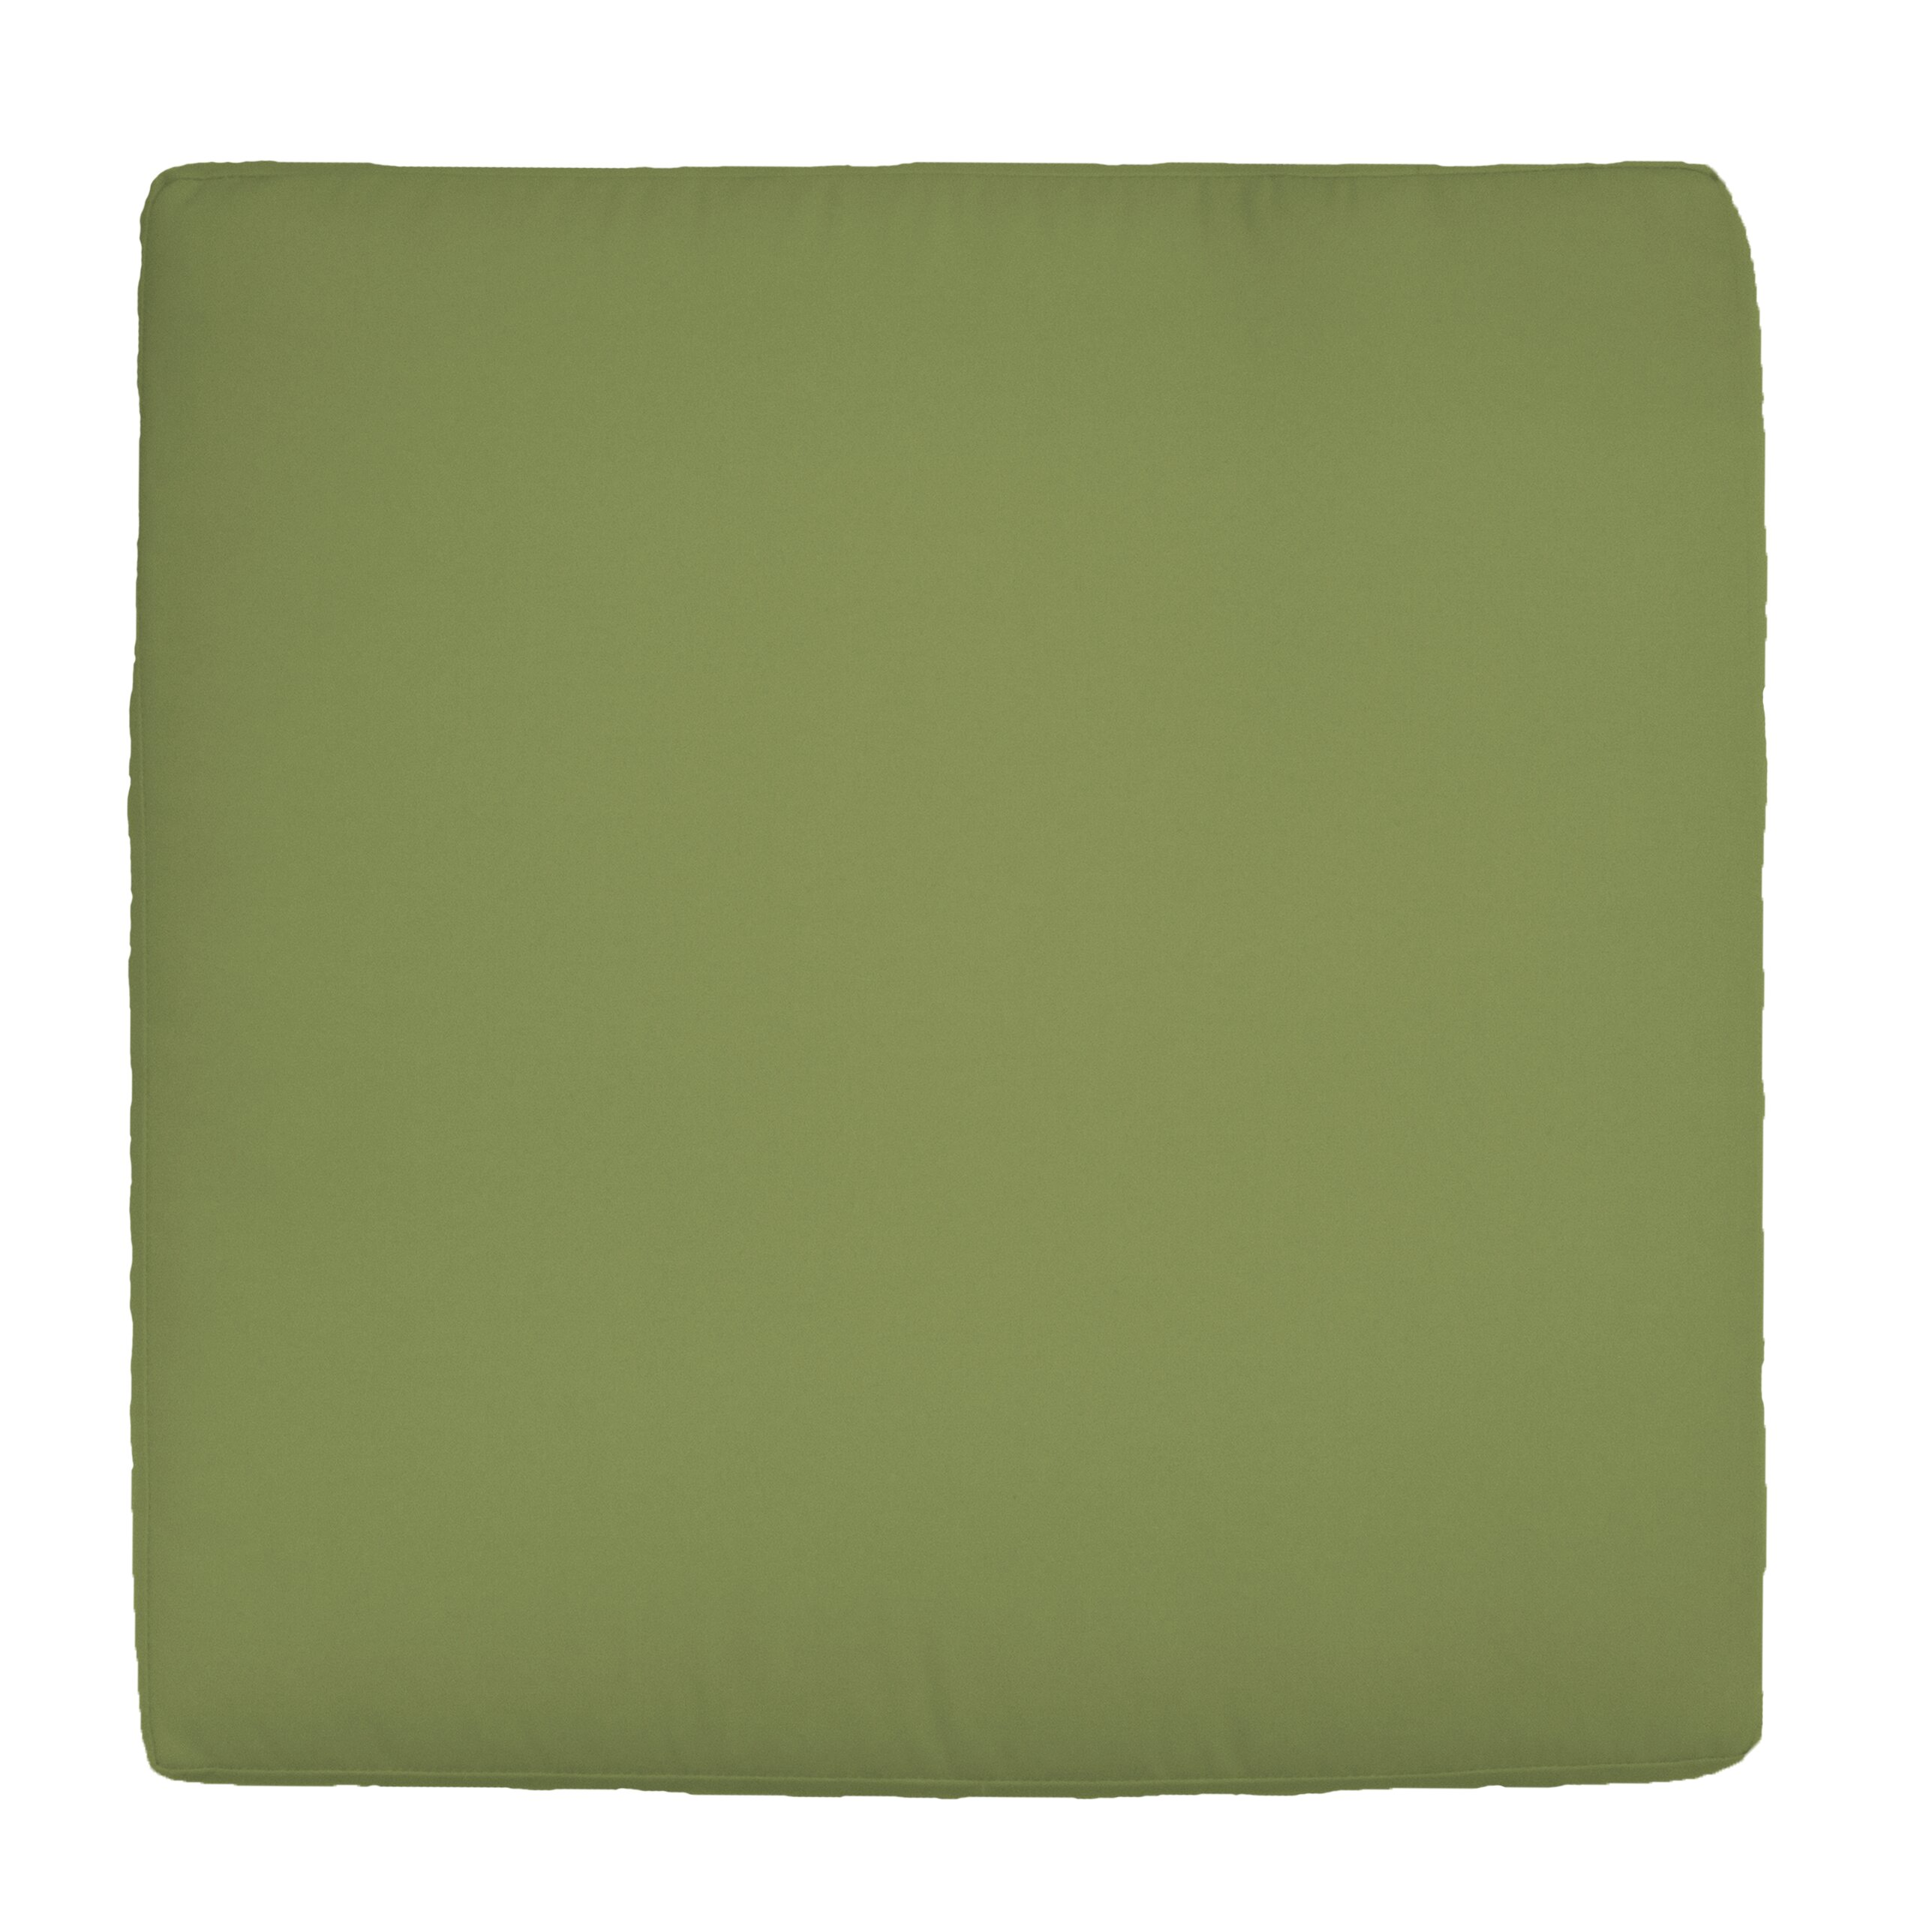 custom outdoor cushions double piped outdoor sunbrella ottoman cushion